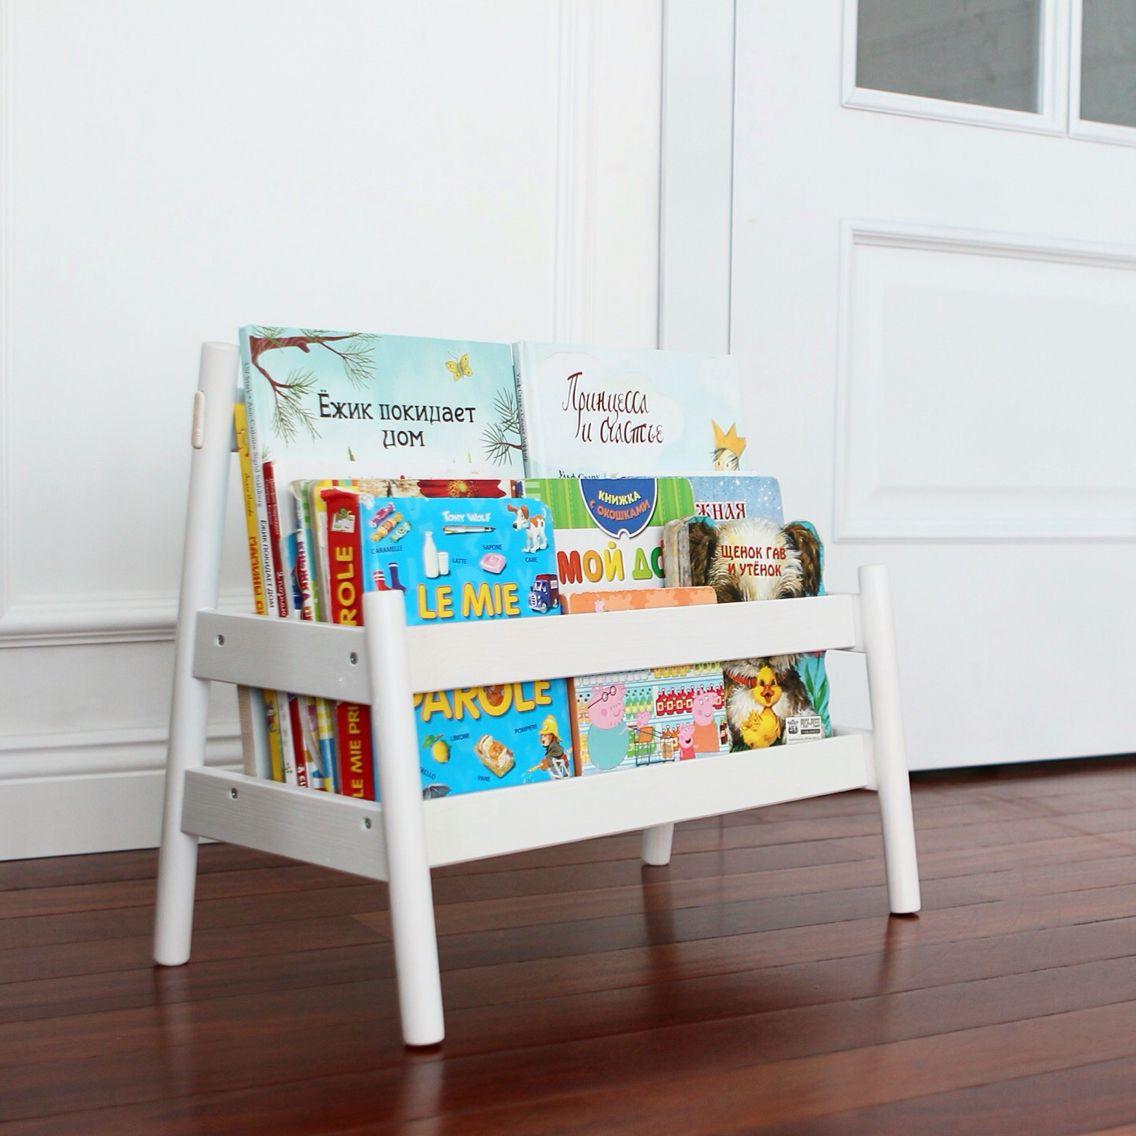 Ikea flisat bookstorage makeover ikea flisat kidsroom for Ikea ninos juguetes